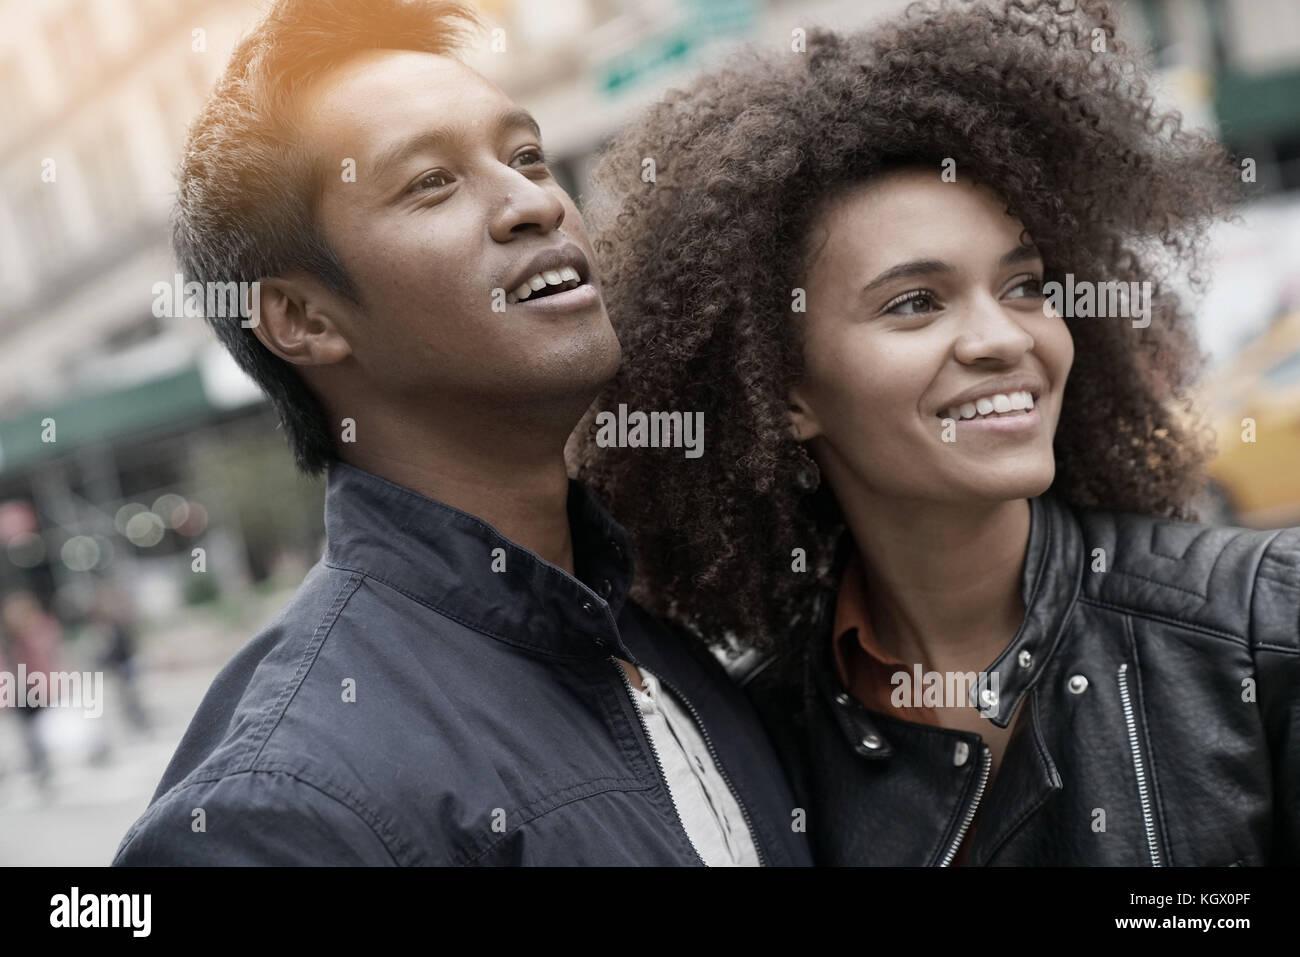 Ethnic couple walking in new york city street sur jour de pluie Photo Stock